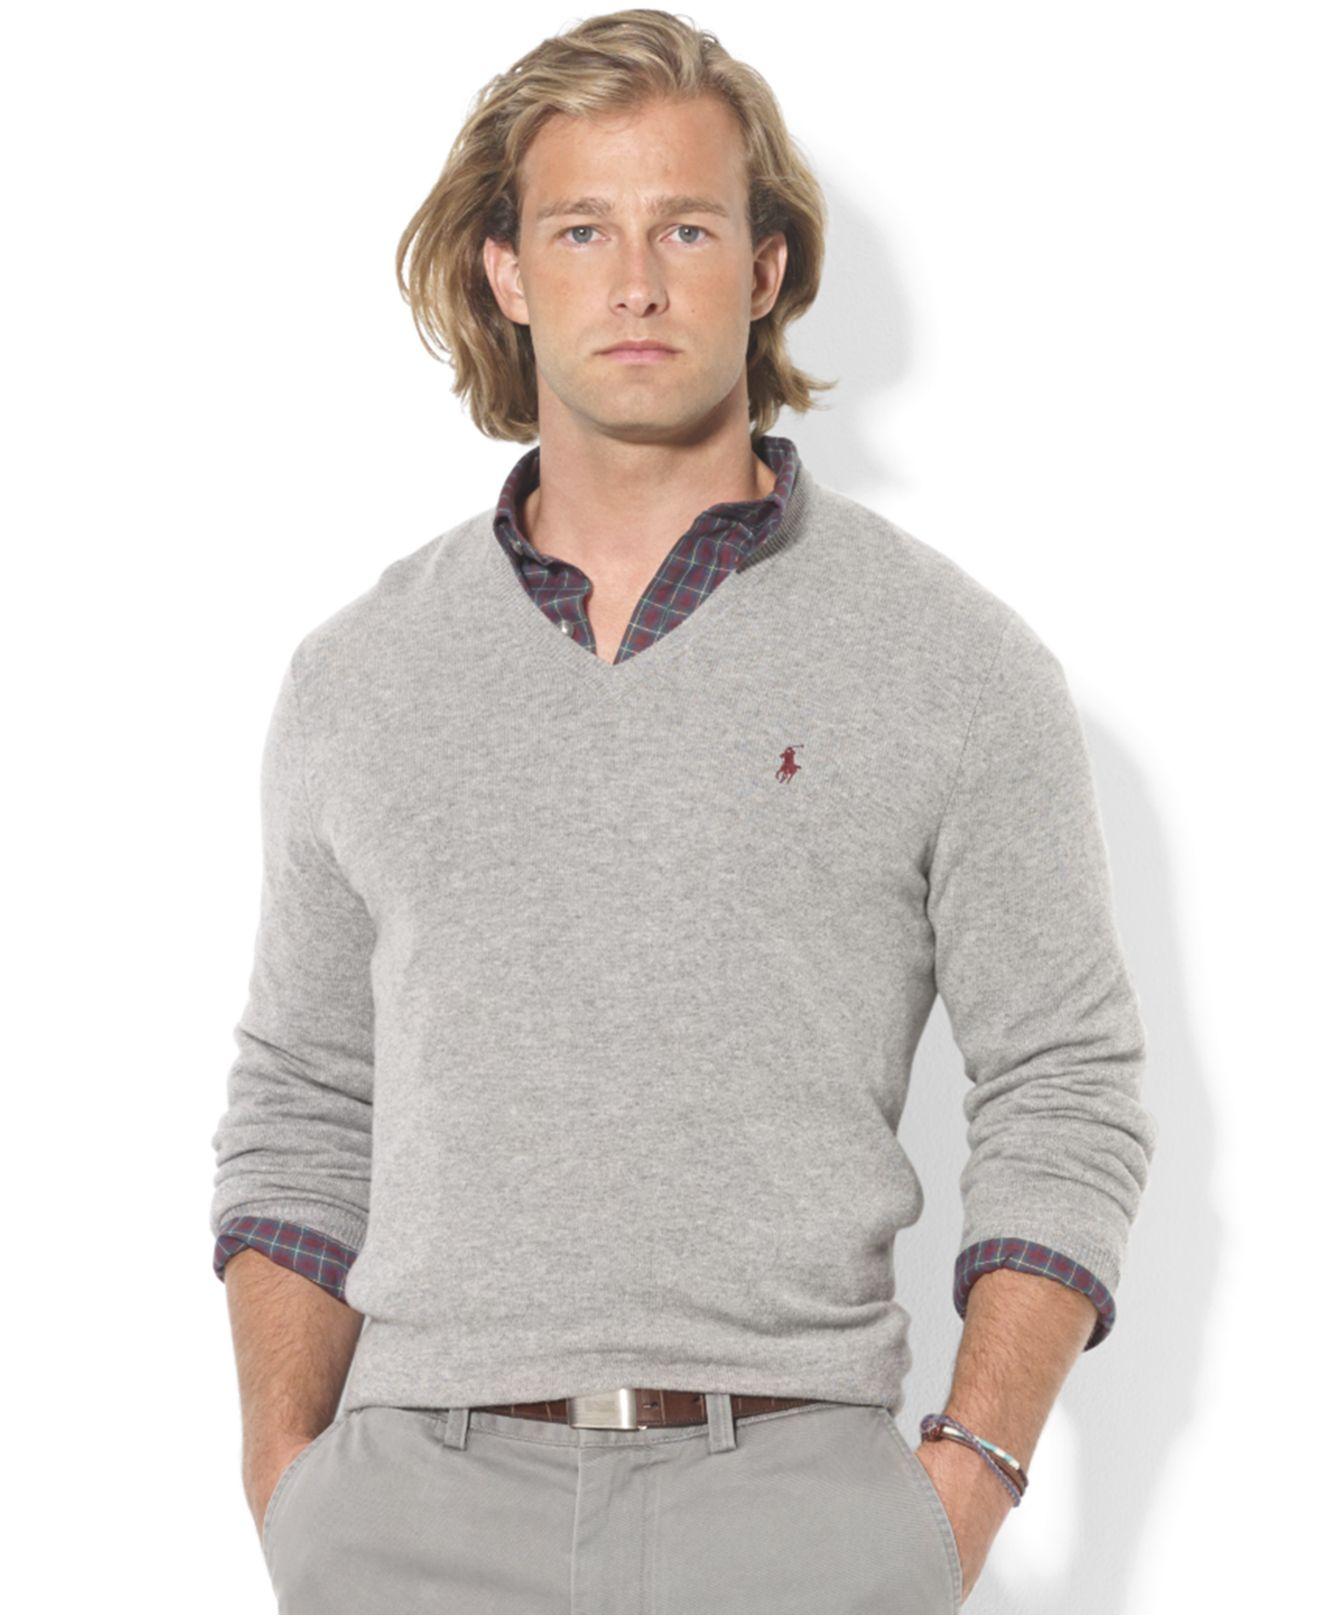 be07bf6fa Polo Ralph Lauren V-Neck Merino Wool Sweater in Gray for Men - Lyst